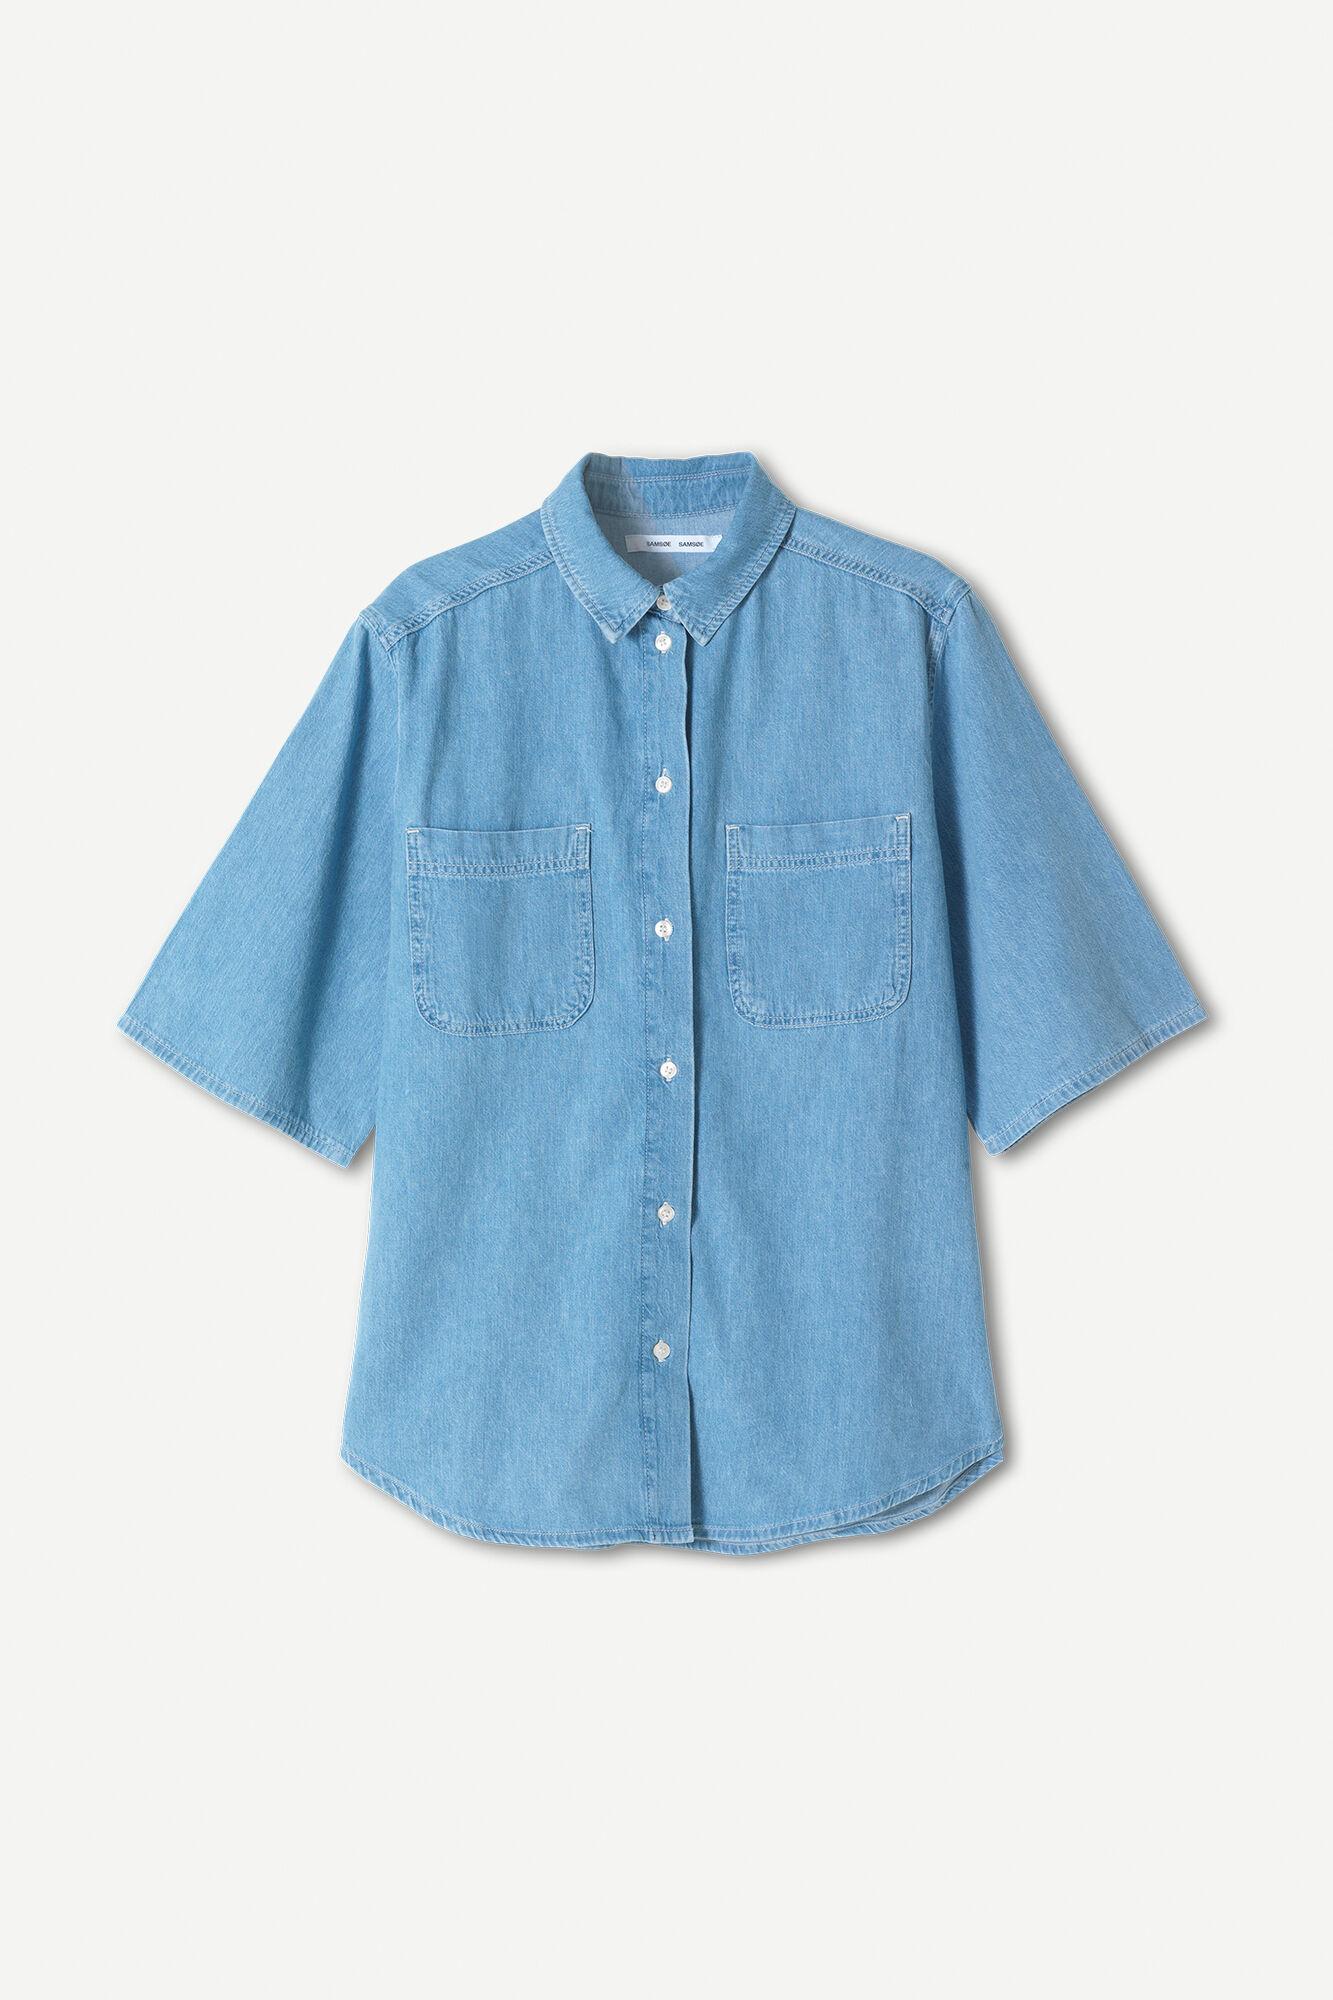 Lotta shirt 13165